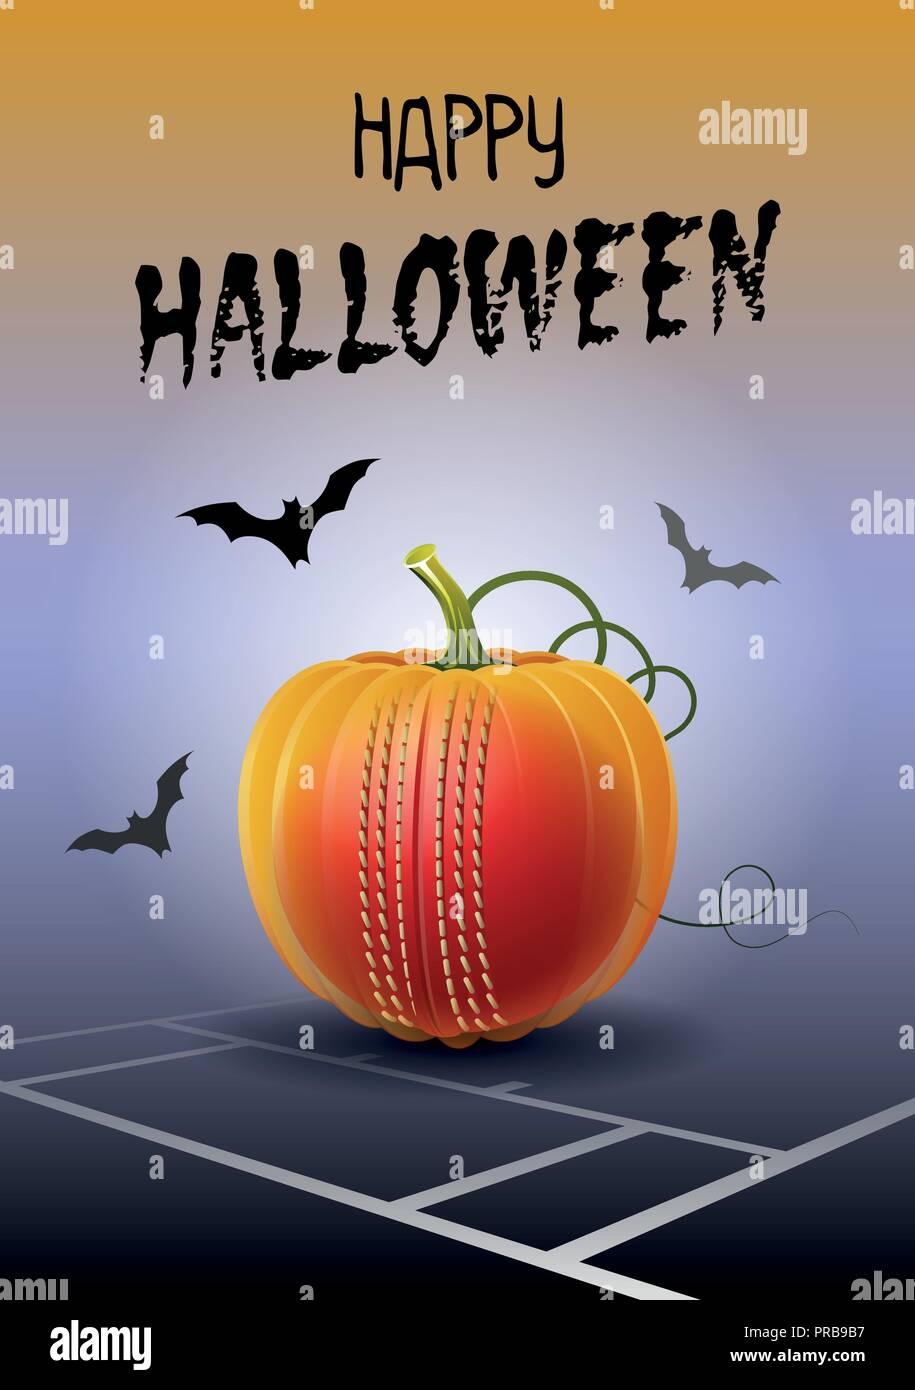 Happy halloween sports greeting card realistic cricket ball in the happy halloween sports greeting card realistic cricket ball in the shape of a pumpkin vector illustration m4hsunfo